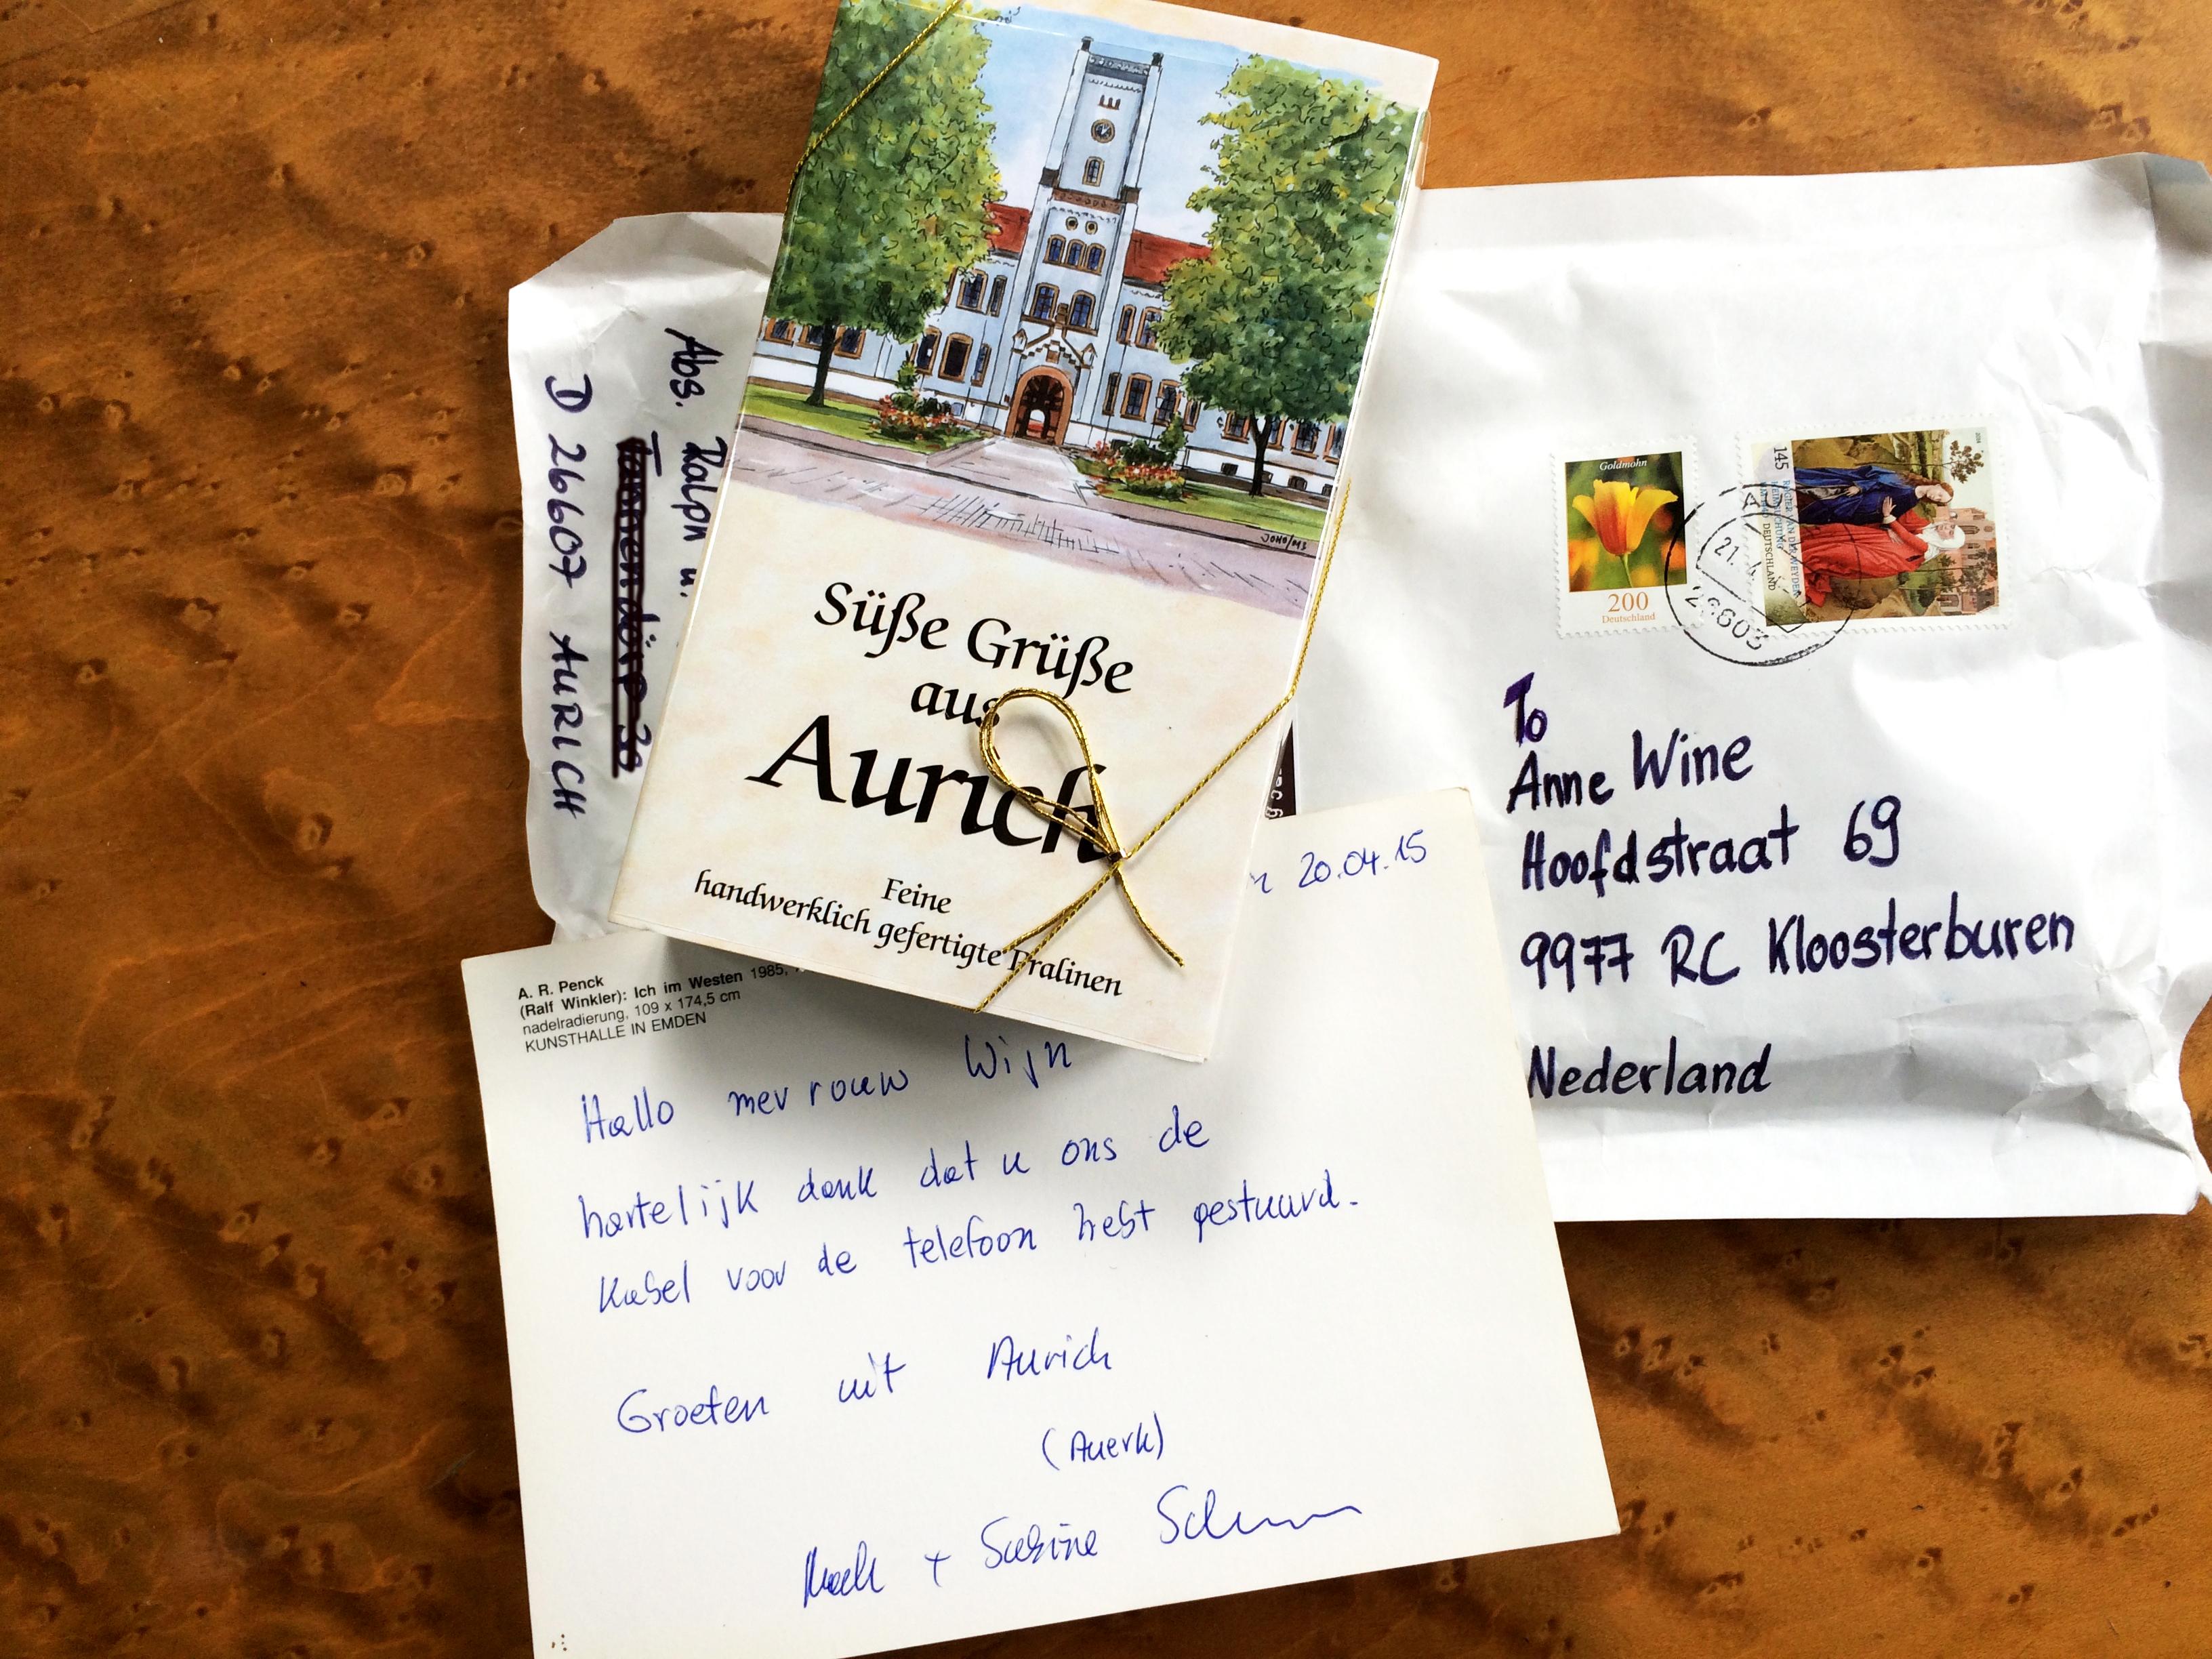 Bedank Uit Aurich